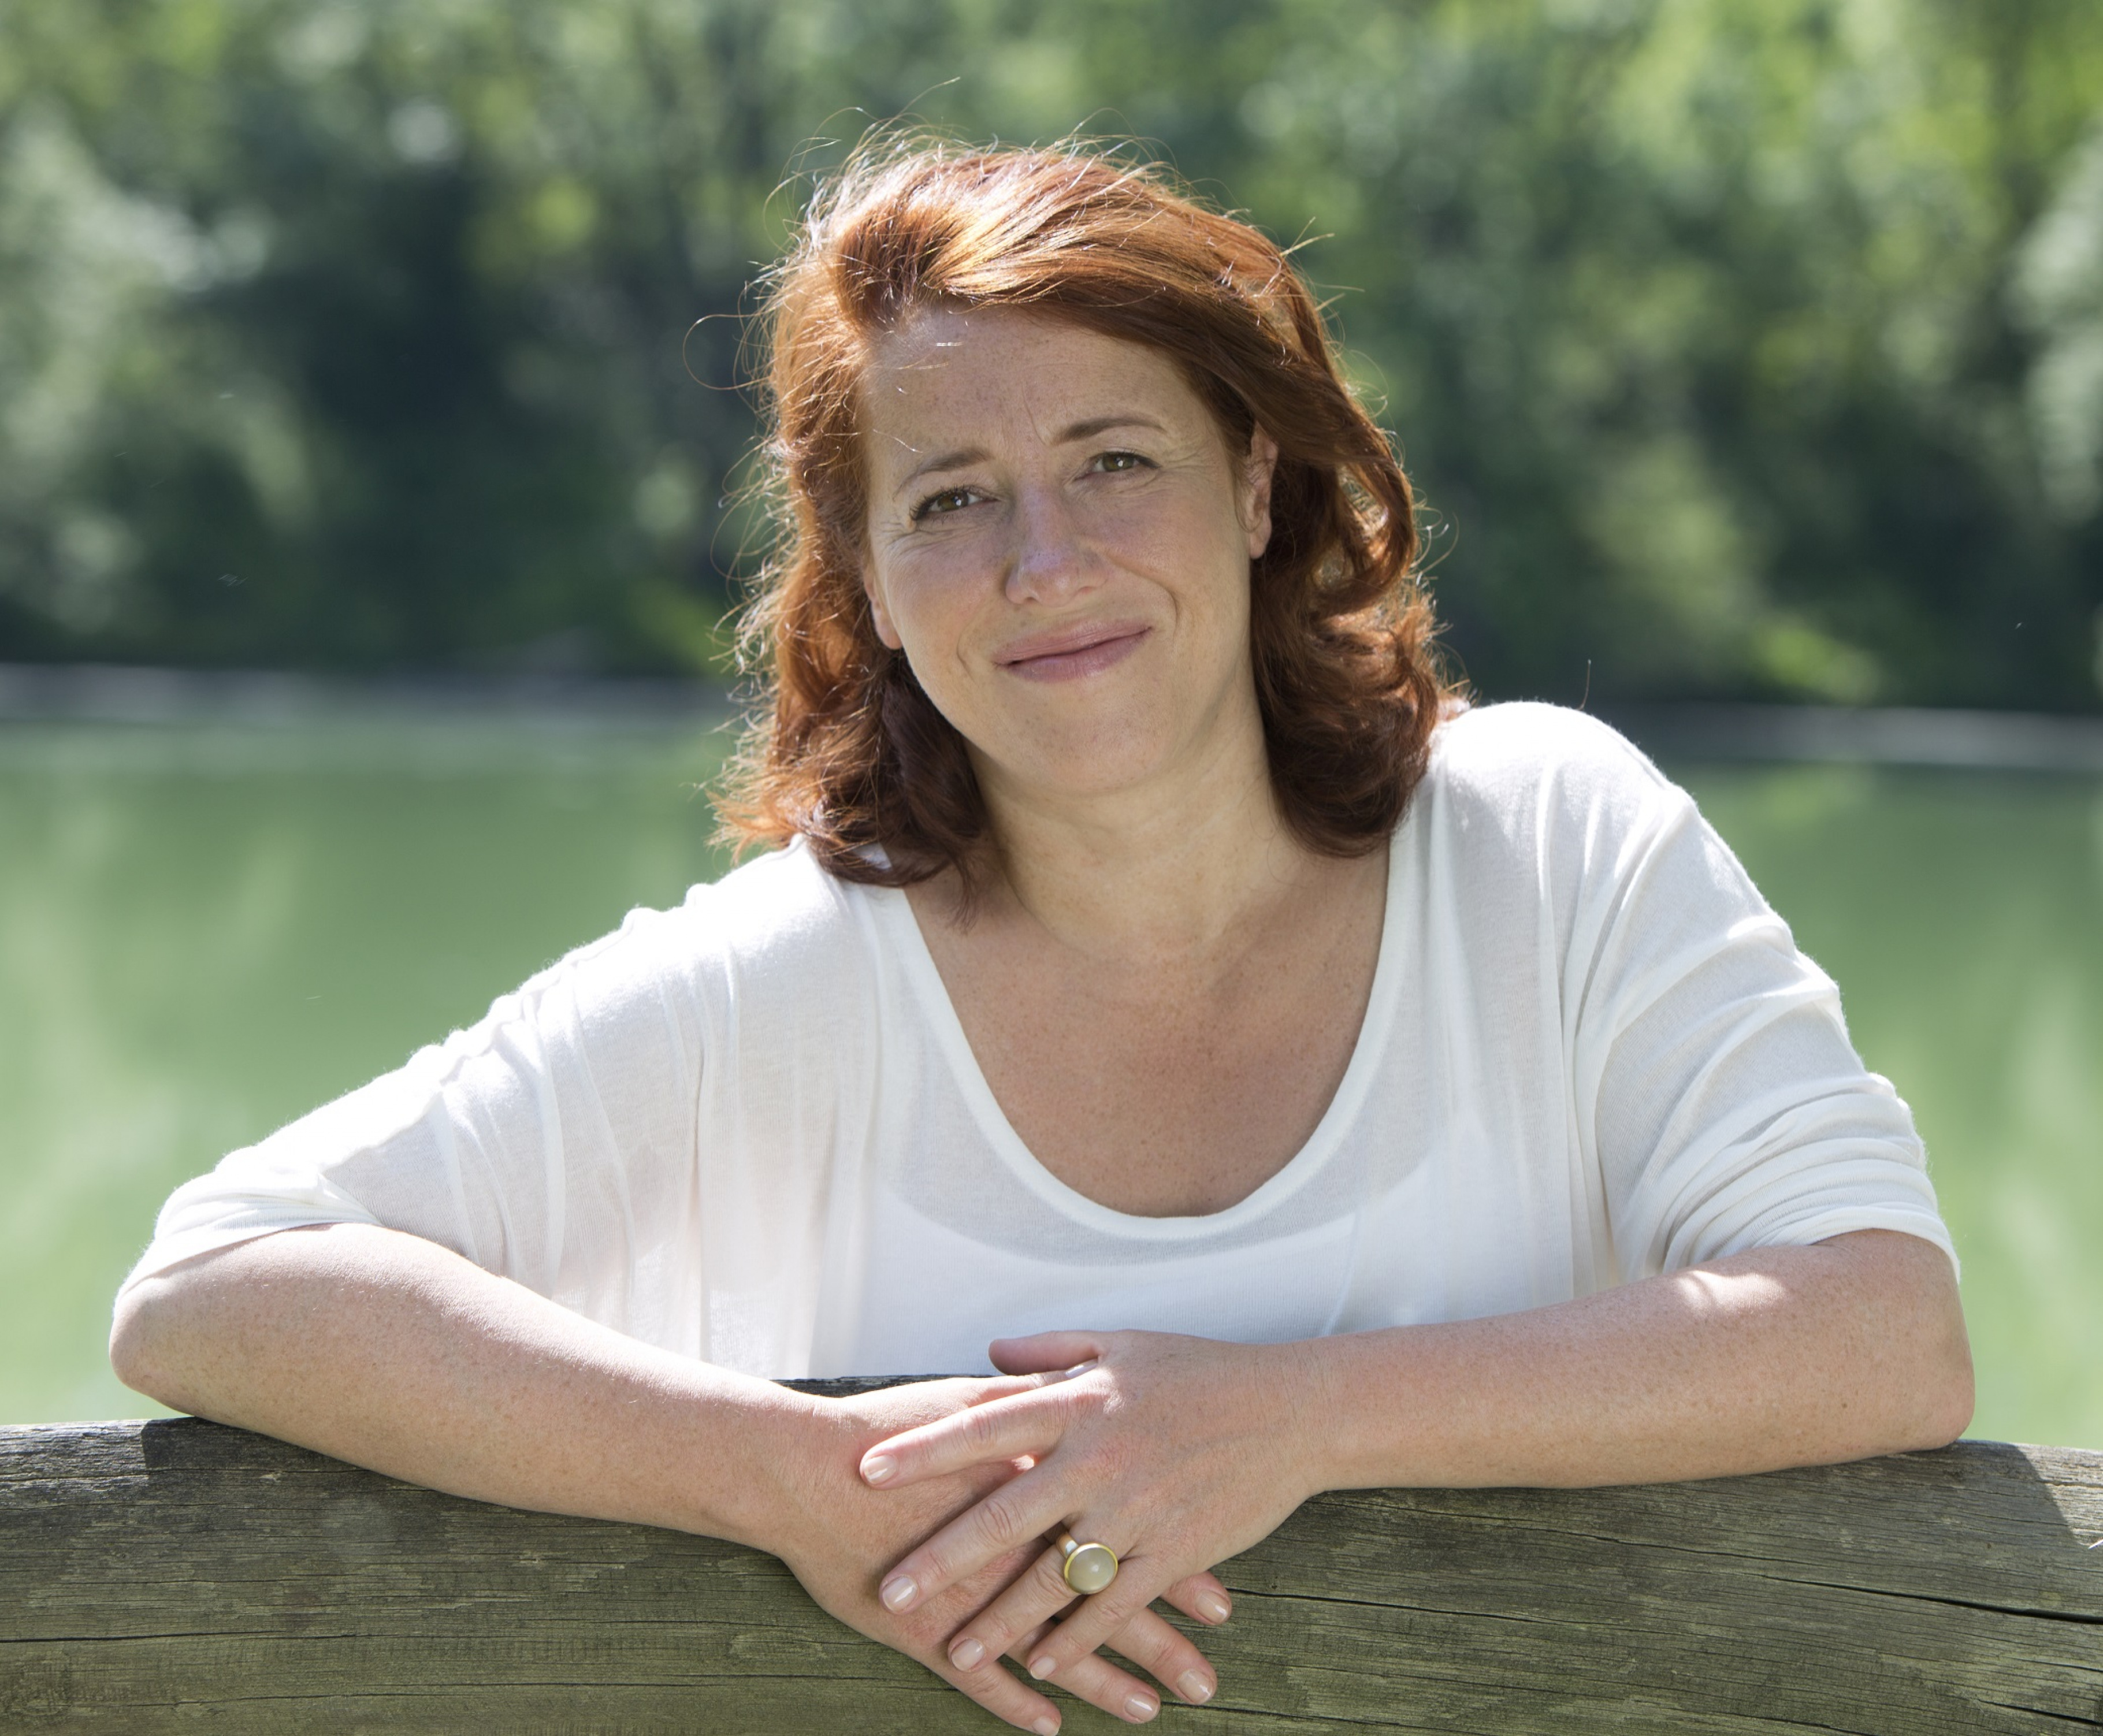 Kabarettistin und Oxfam-Kundin Luise Kinseher